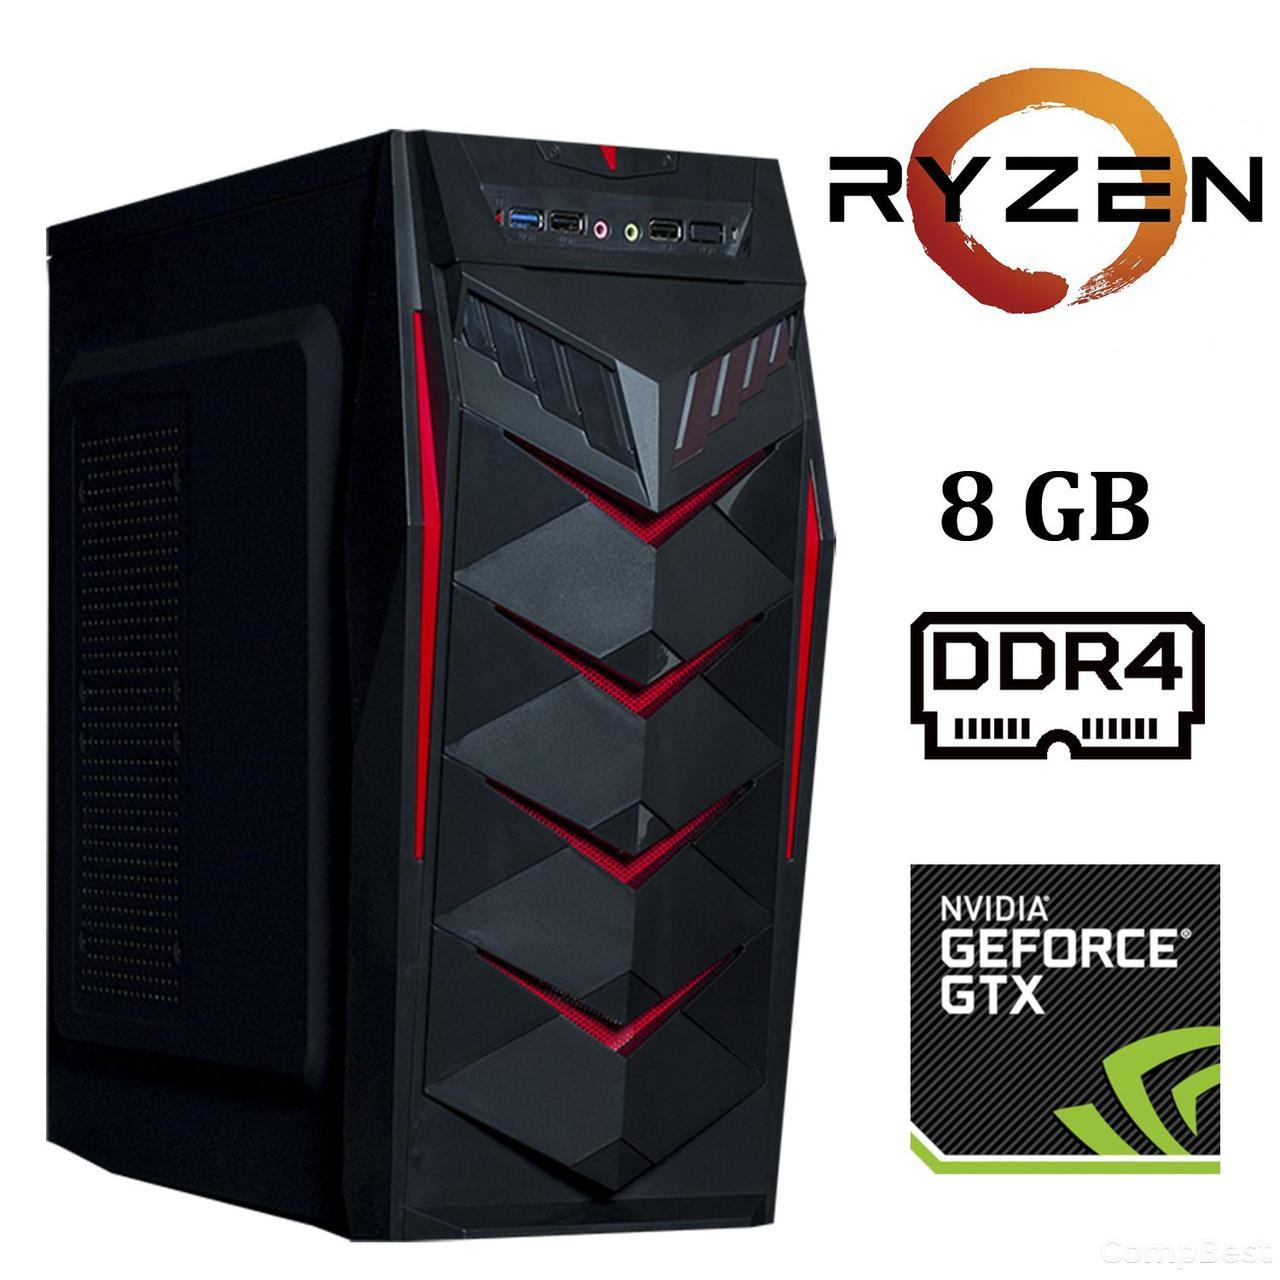 Frontier JUMBO MT / AMD Ryzen™ 3 1200 (4 ядра по 3.1 - 3.4 GHz) / 8 GB DDR4 / 1000 GB HDD / nVidia GeForce GTX 1050 Ti (4 GB GDDR5 128 bit)